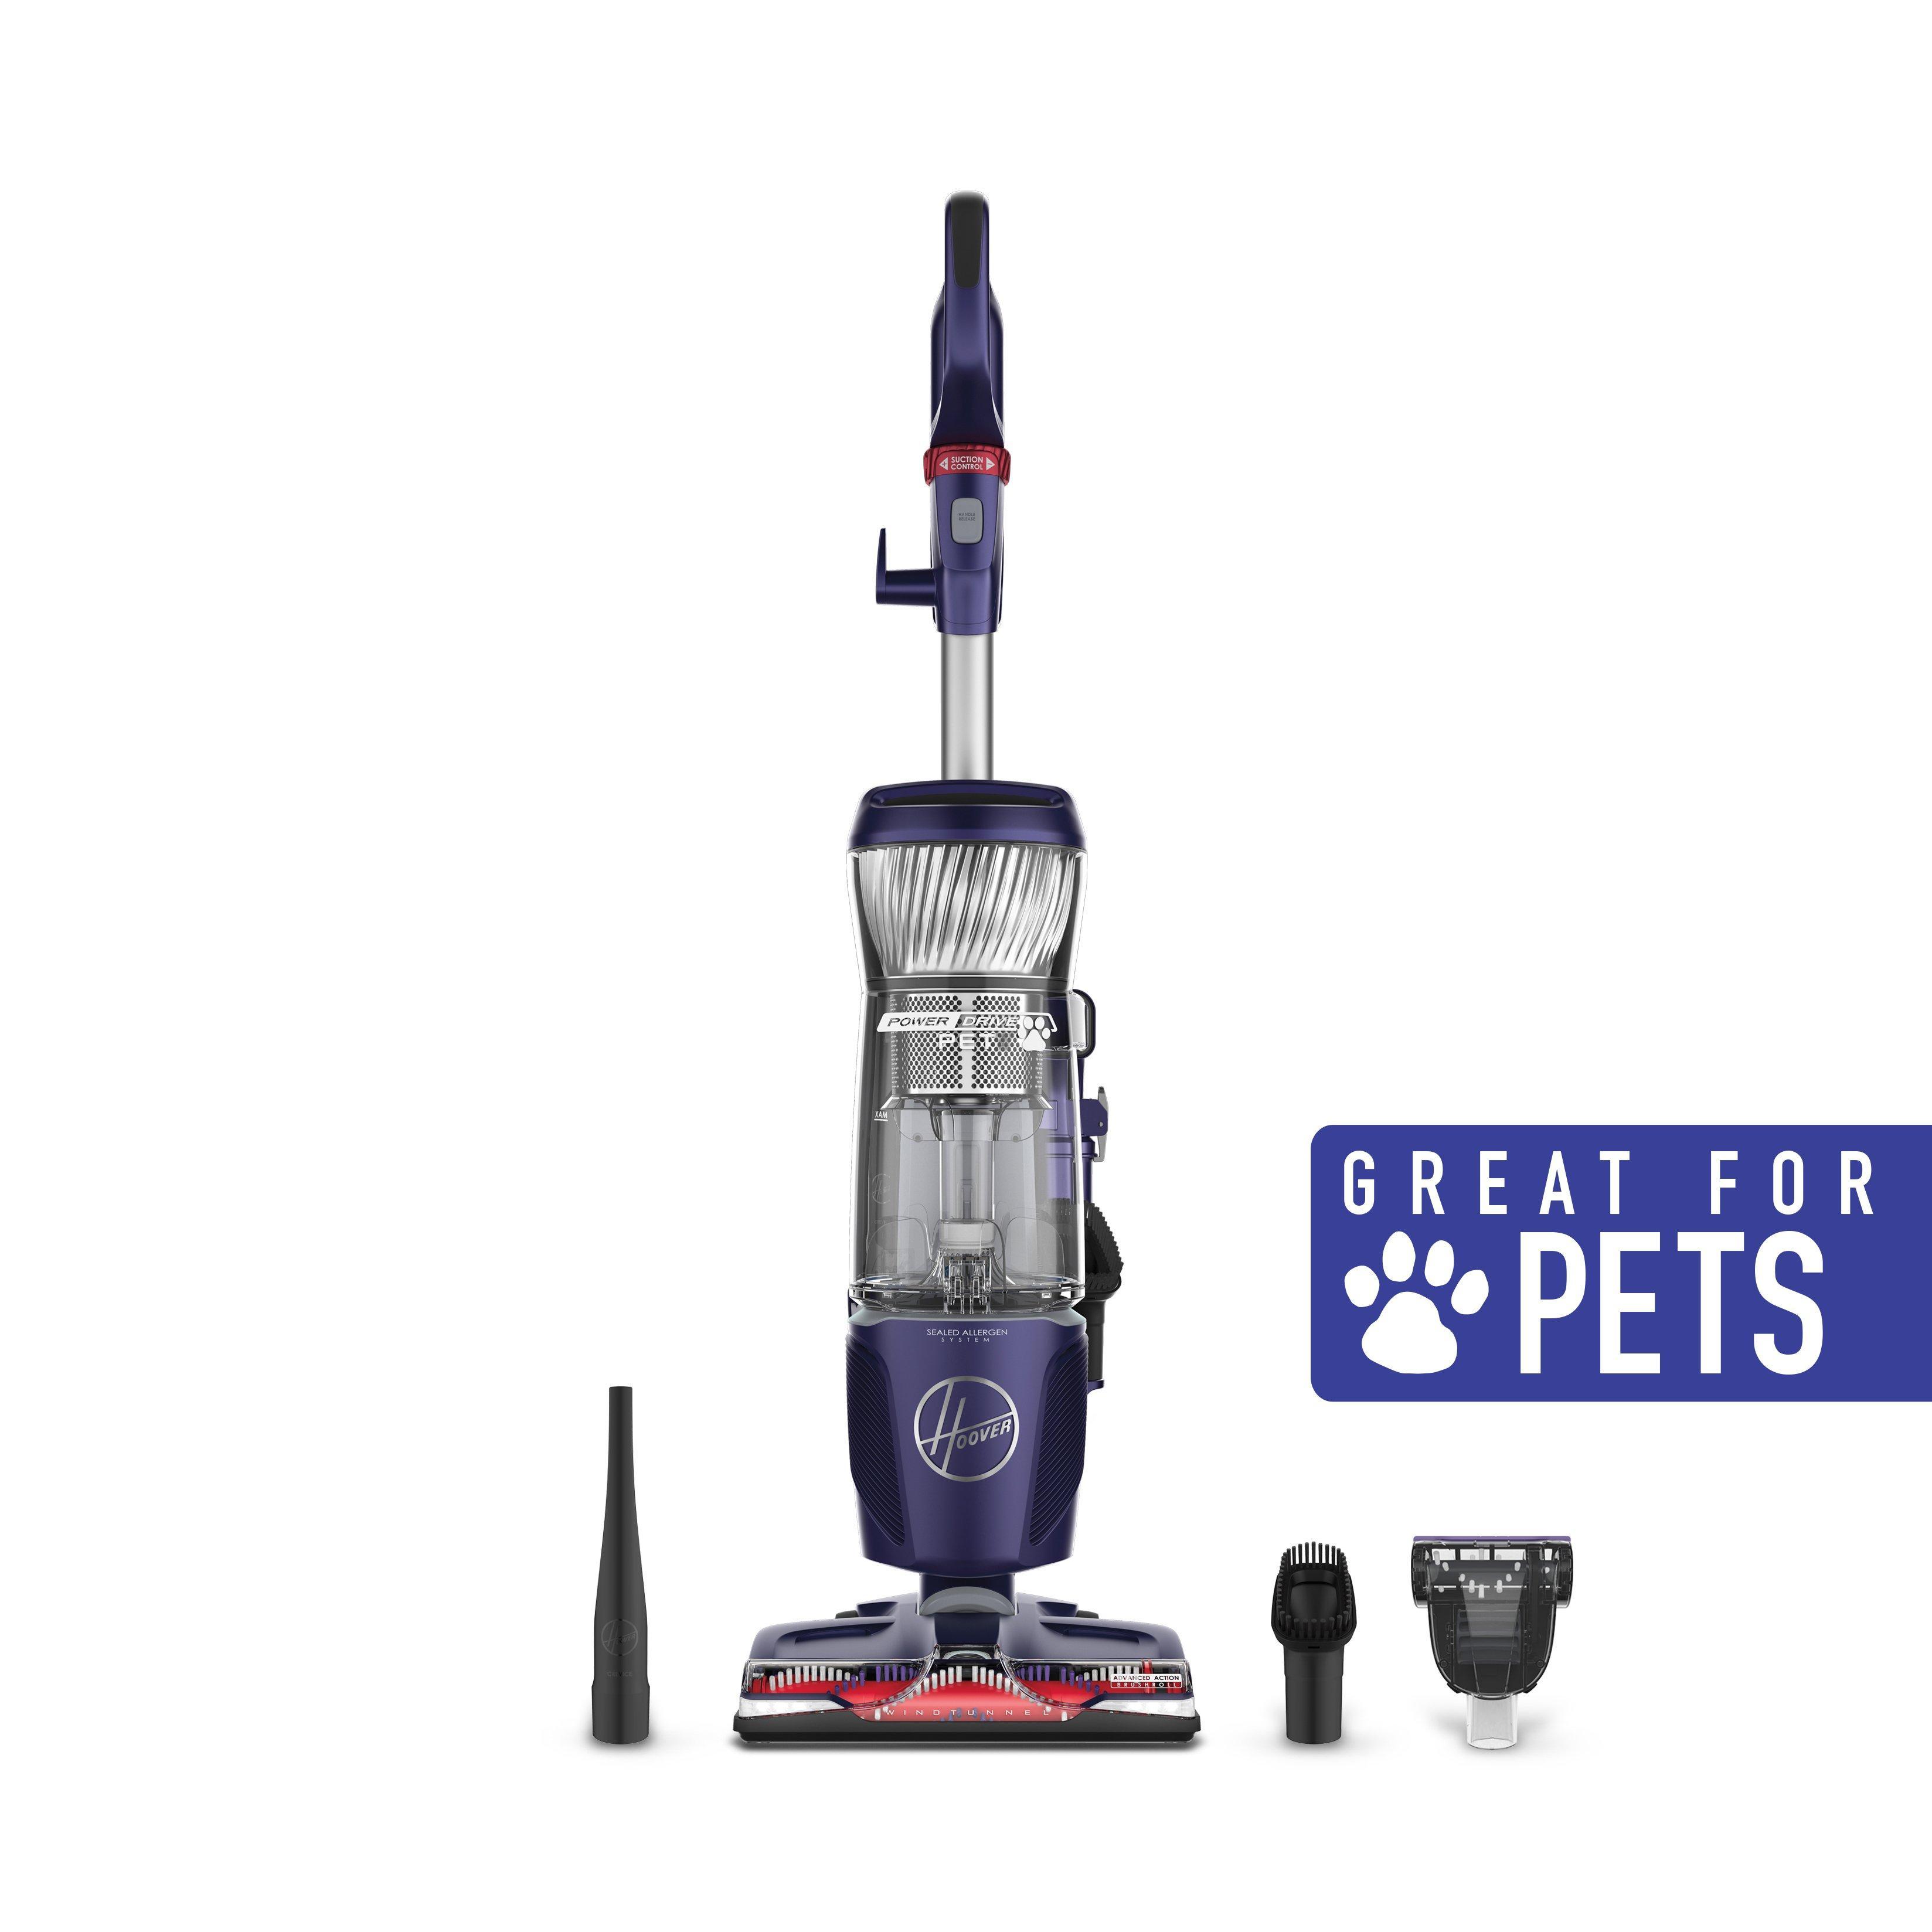 powerdrive pet upright vacuum uh74210pc  [ 960 x 960 Pixel ]